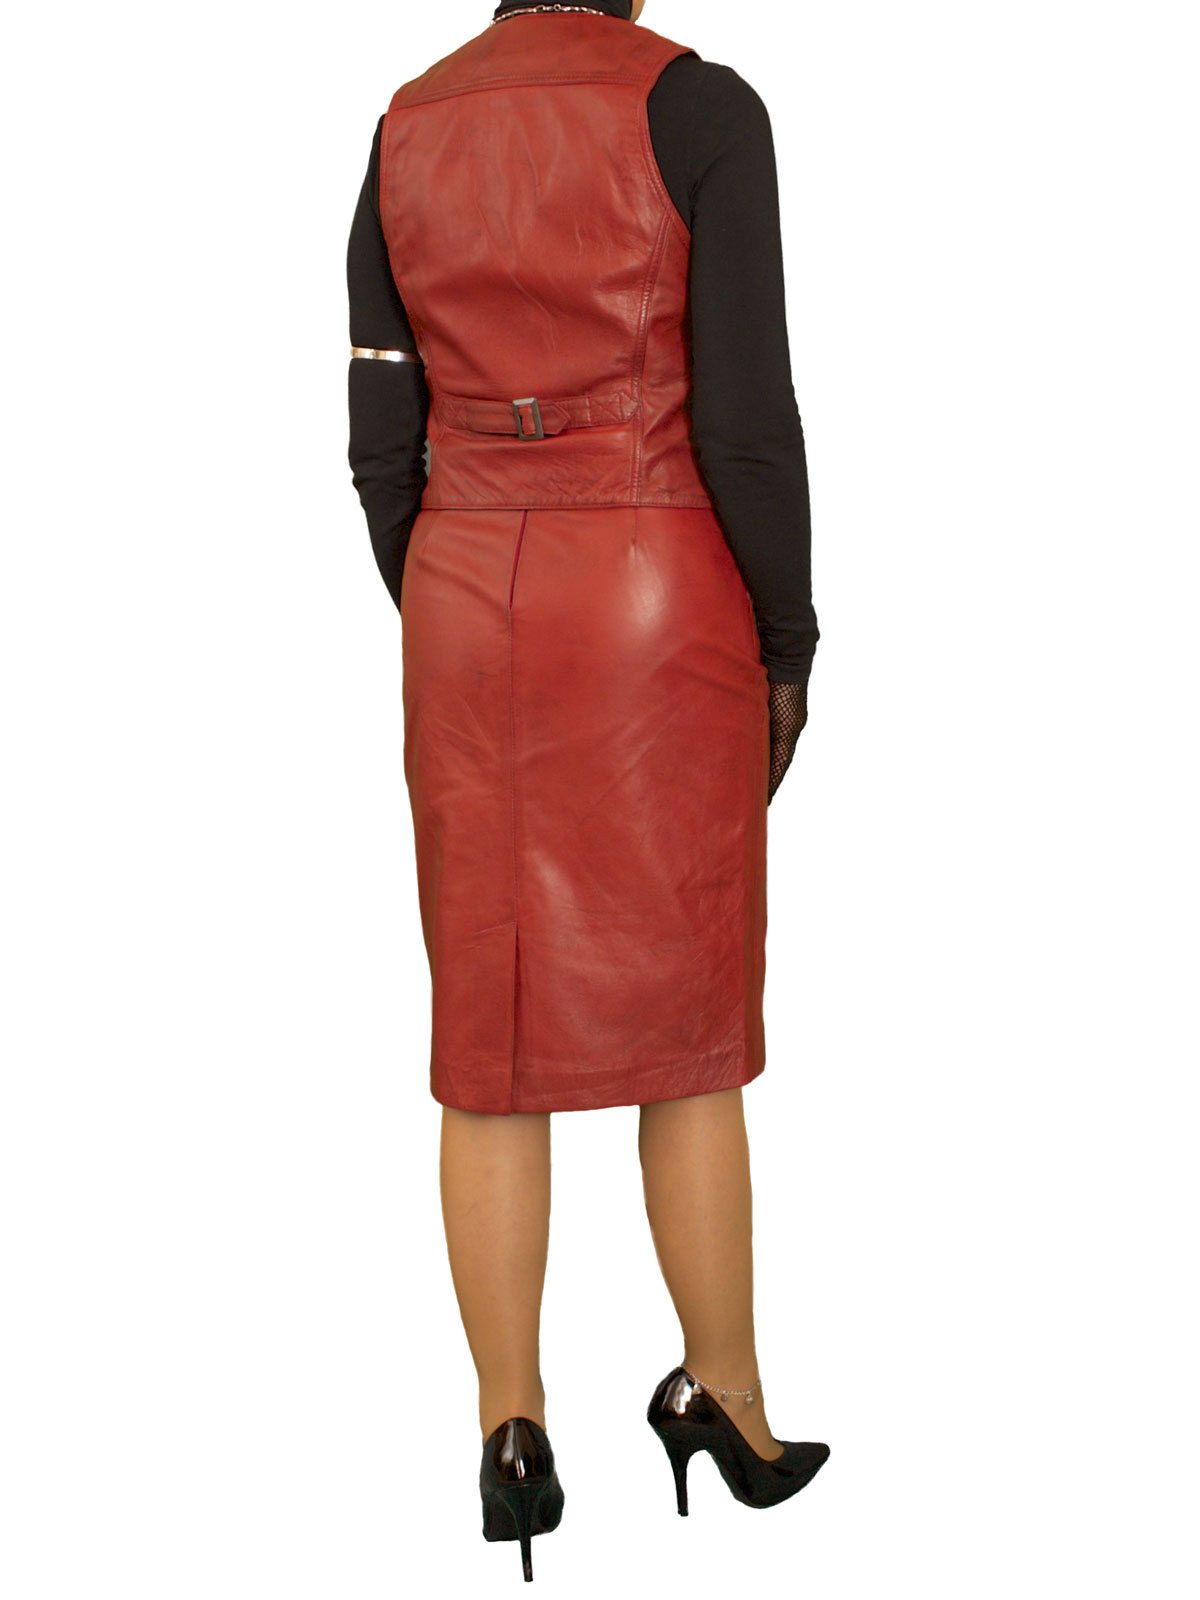 Womens Leather Outfit Pencil Skirt Waistcoat - Tout Ensemble